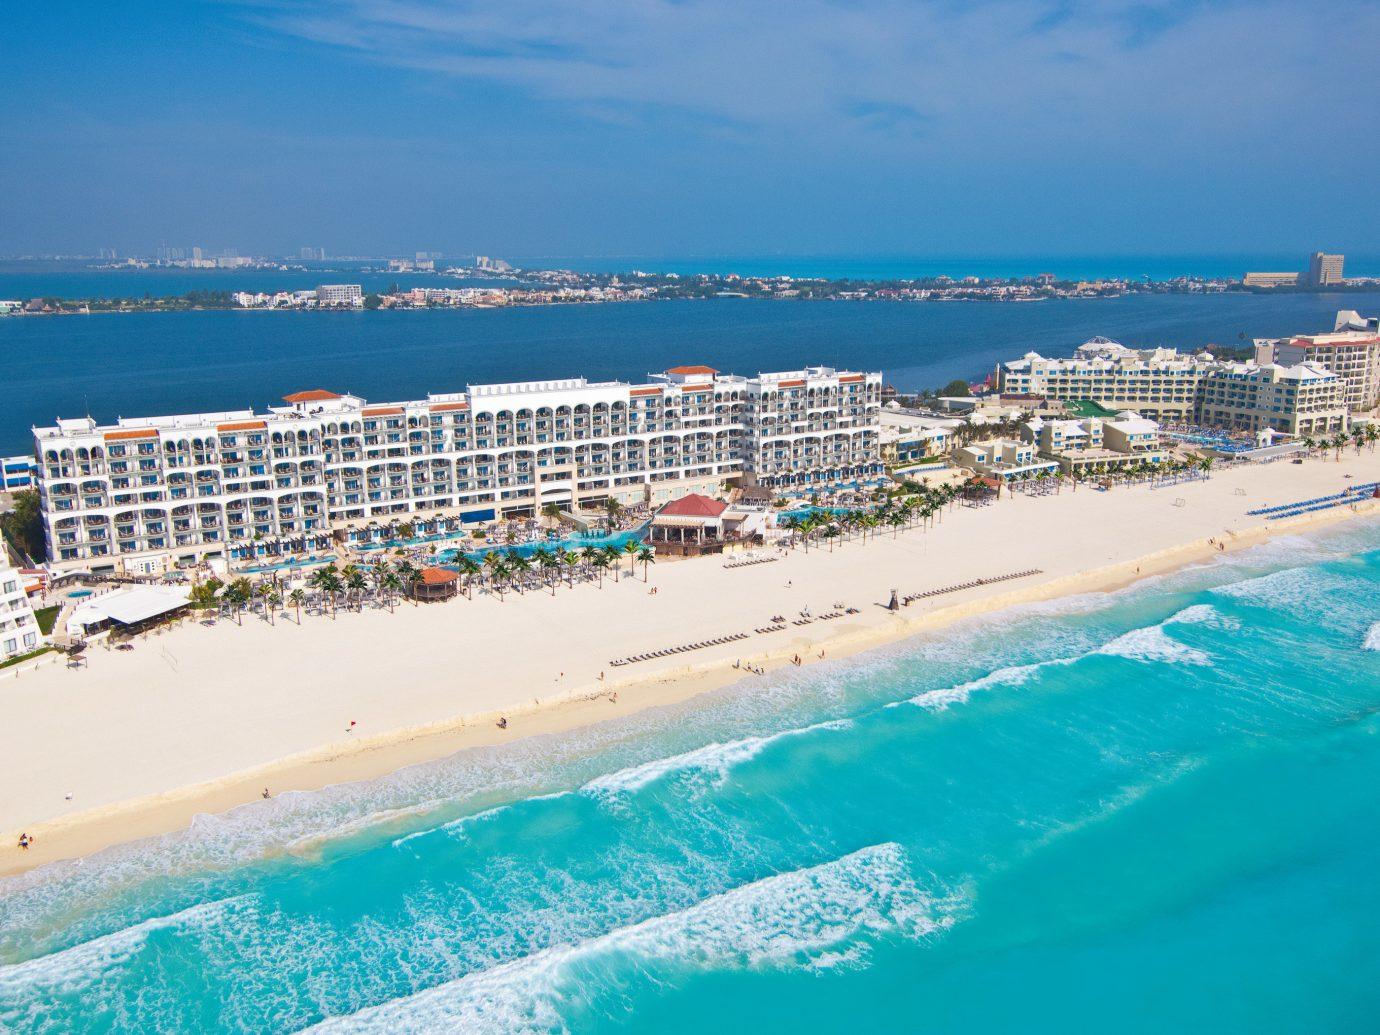 Hotels sky outdoor water Sea coastal and oceanic landforms Beach shore vacation Ocean Coast tourism Resort horizon caribbean swimming pool daytime Nature bay leisure